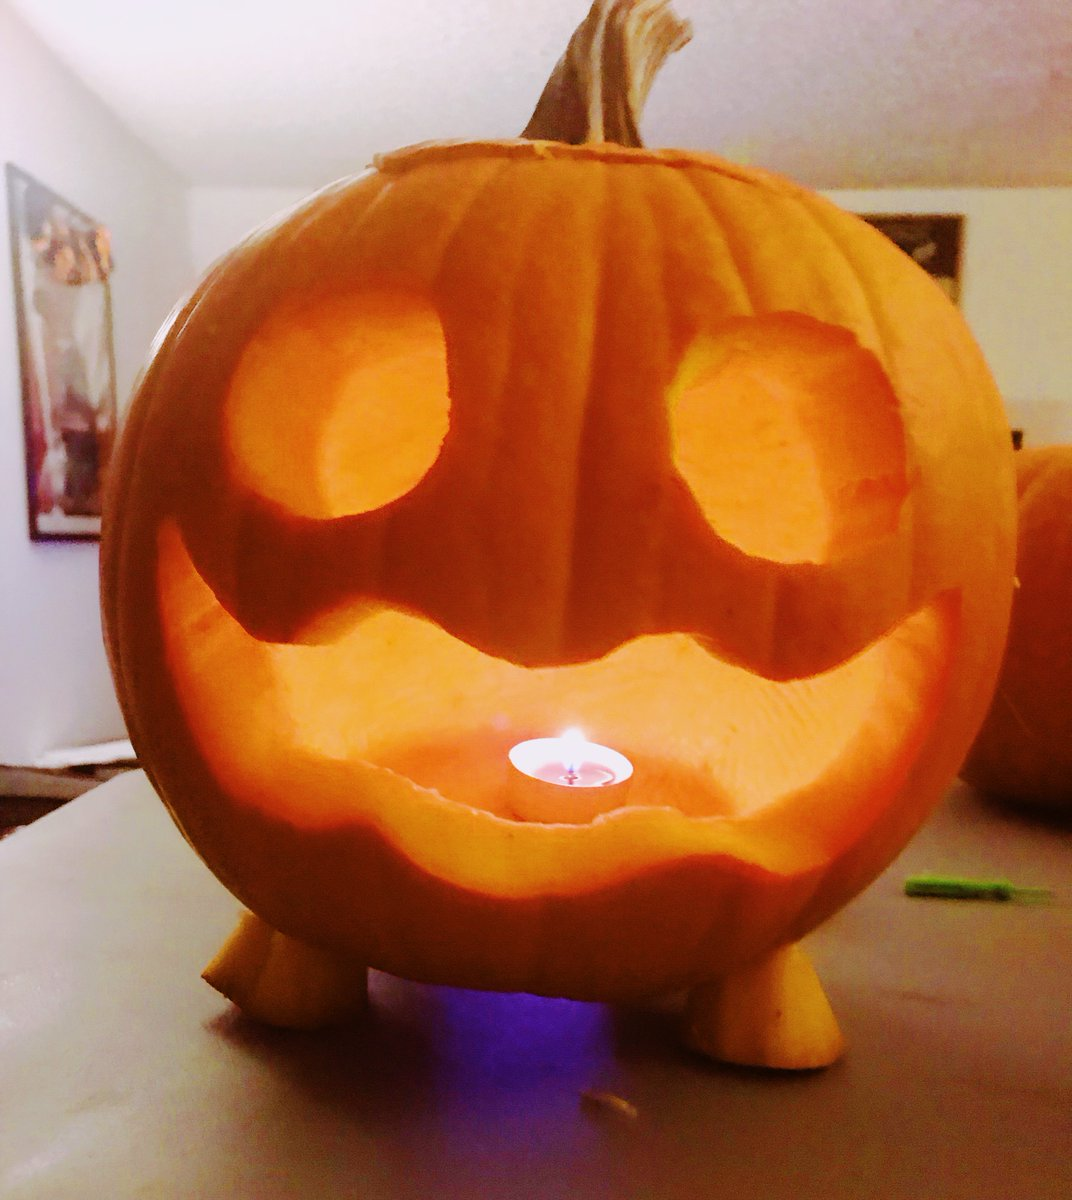 Halloween Pumpkin 2018- Pumpkin from #StevenUniverse!  I had a blast carving this little buddy & making his cute little feet! ✨🎃✨ What kind of pumpkin did you carve this year?  #pumpkin #halloween #pumpkincarving  #fanart #stevenuniversefanart #pumpkins #halloween2018